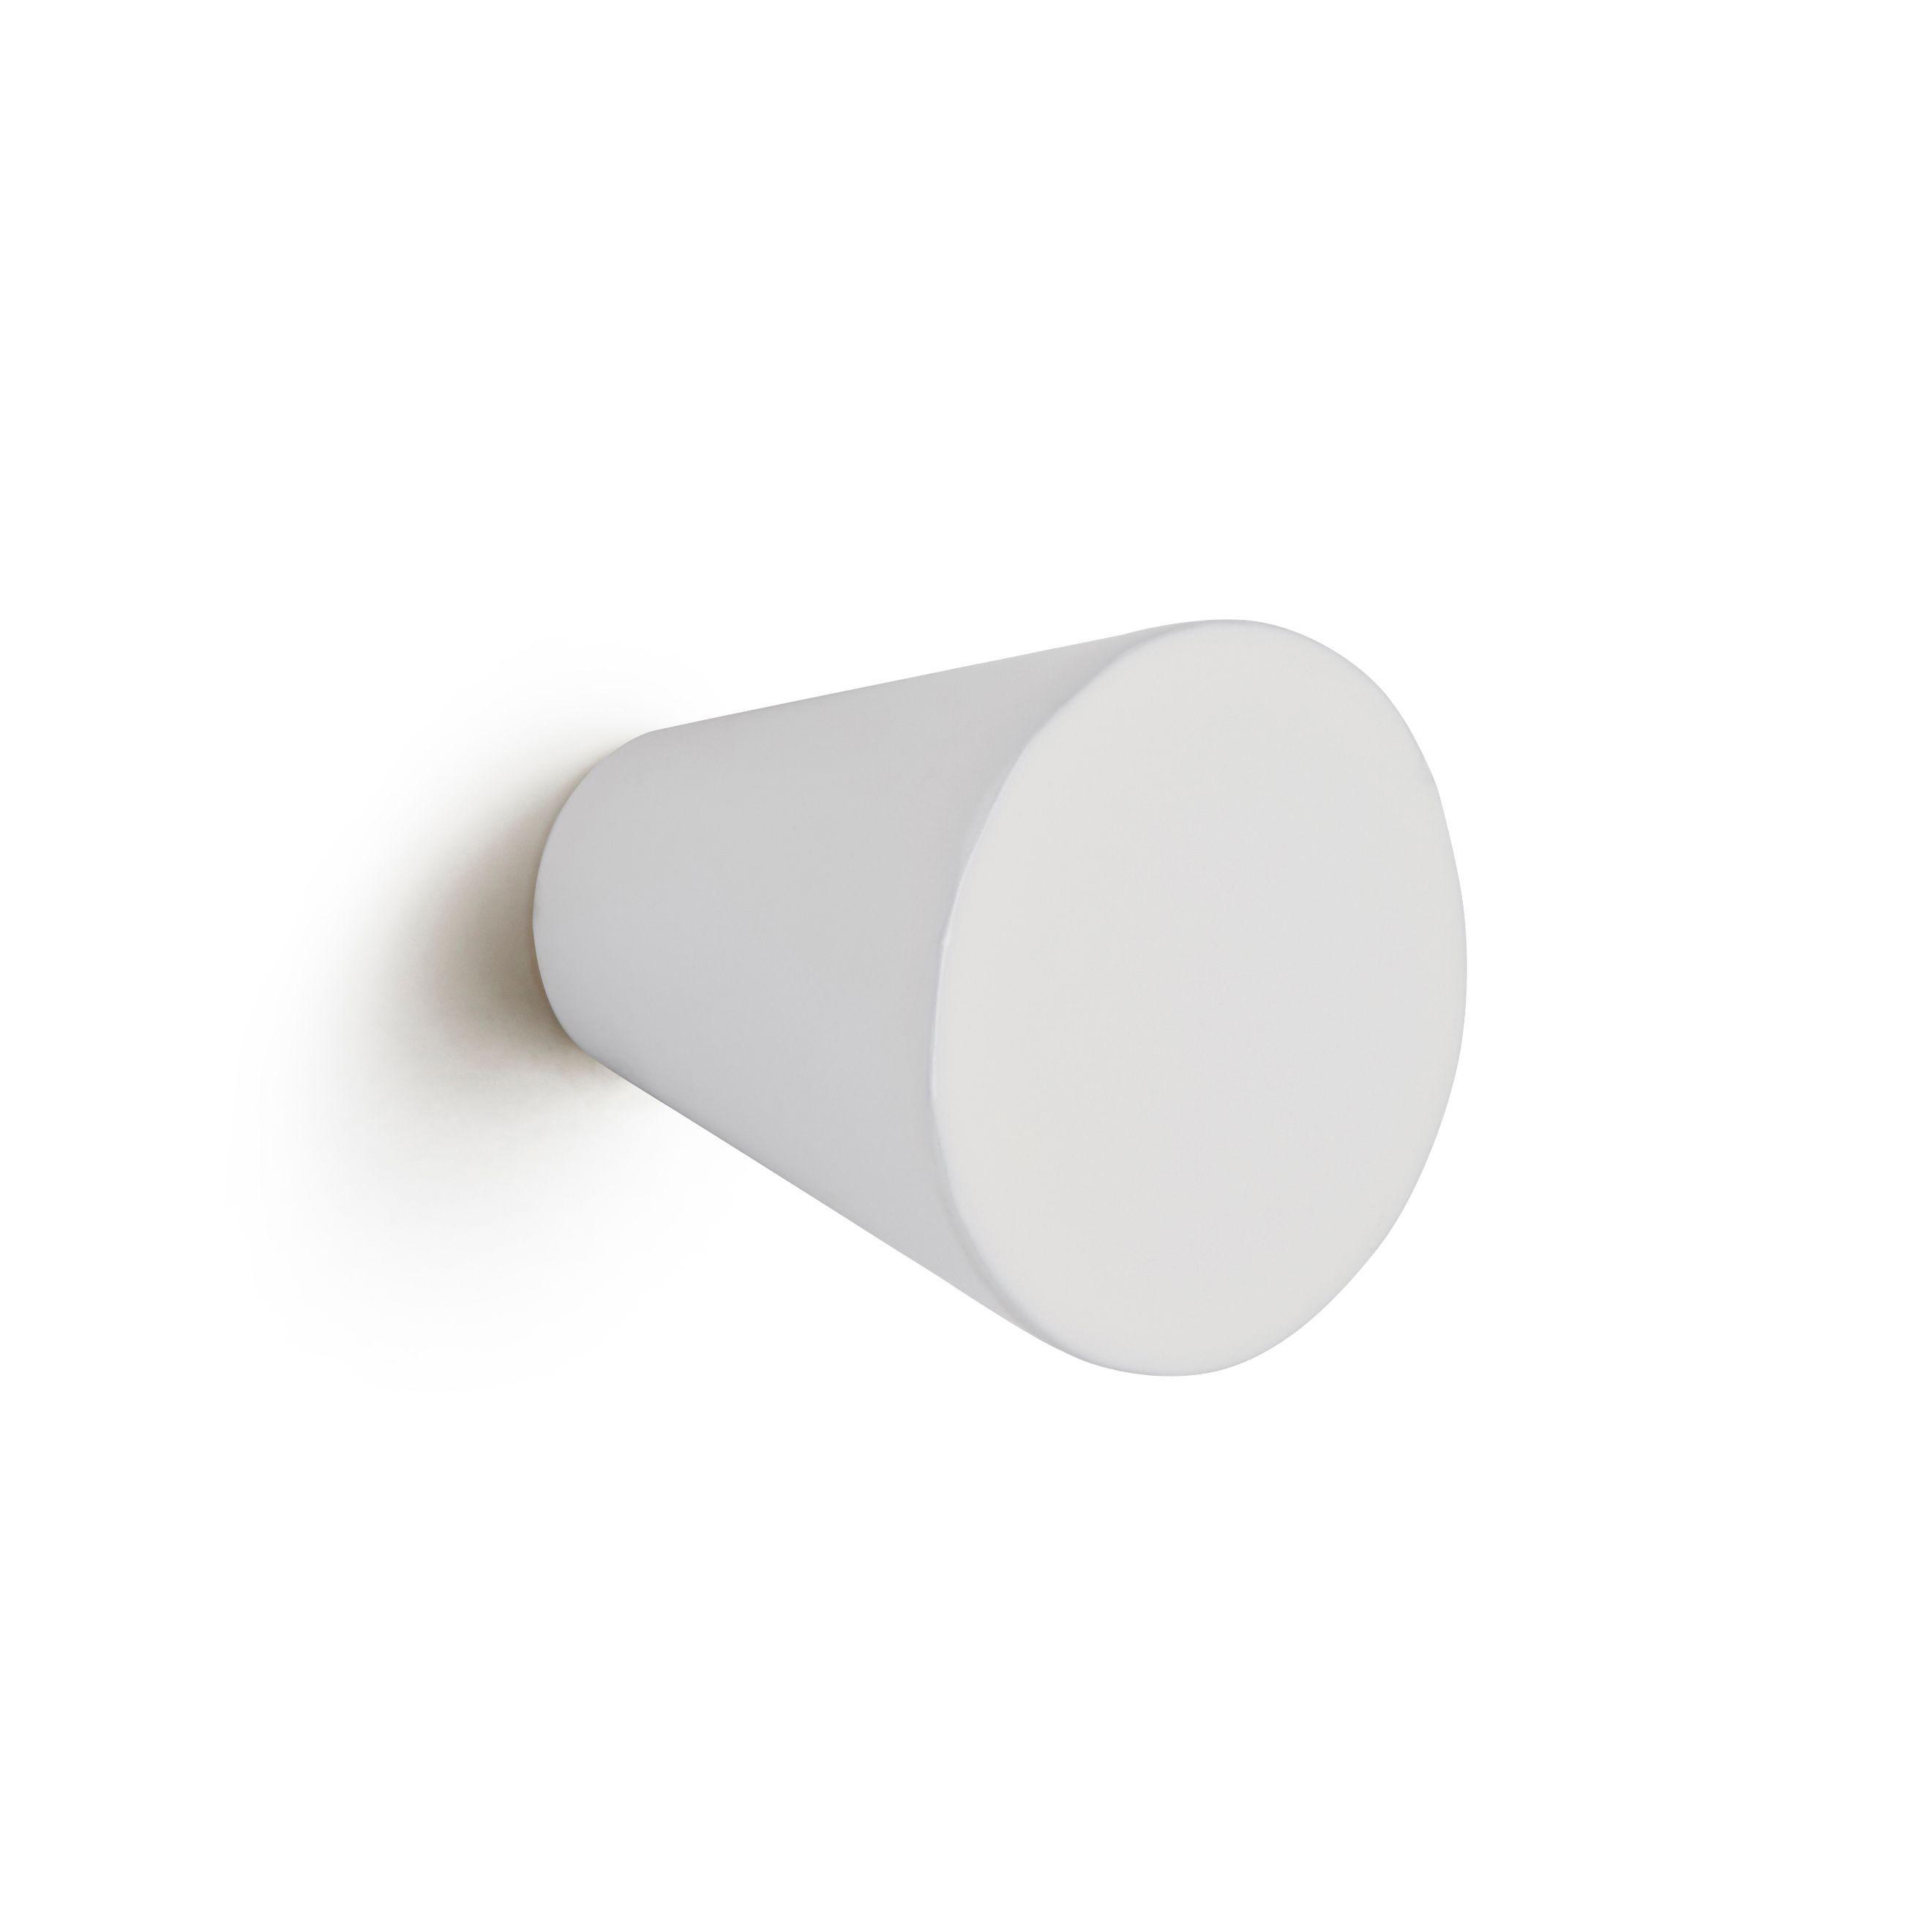 Q >> B&Q White Cone Bedroom Knob Cabinet Handle | Departments | DIY at B&Q